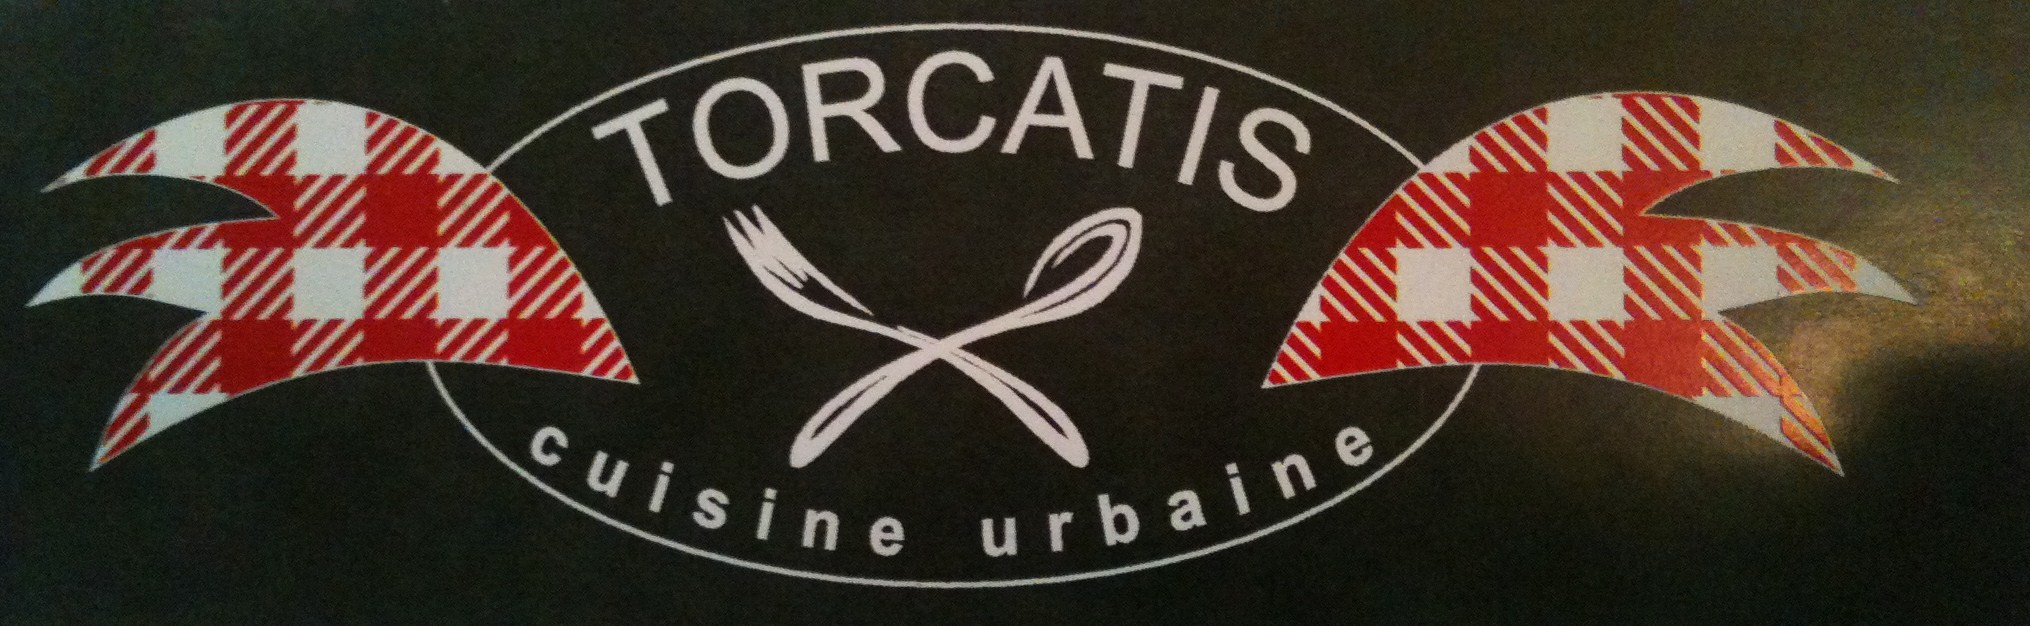 FoodTruck Torcatis - Perpignan